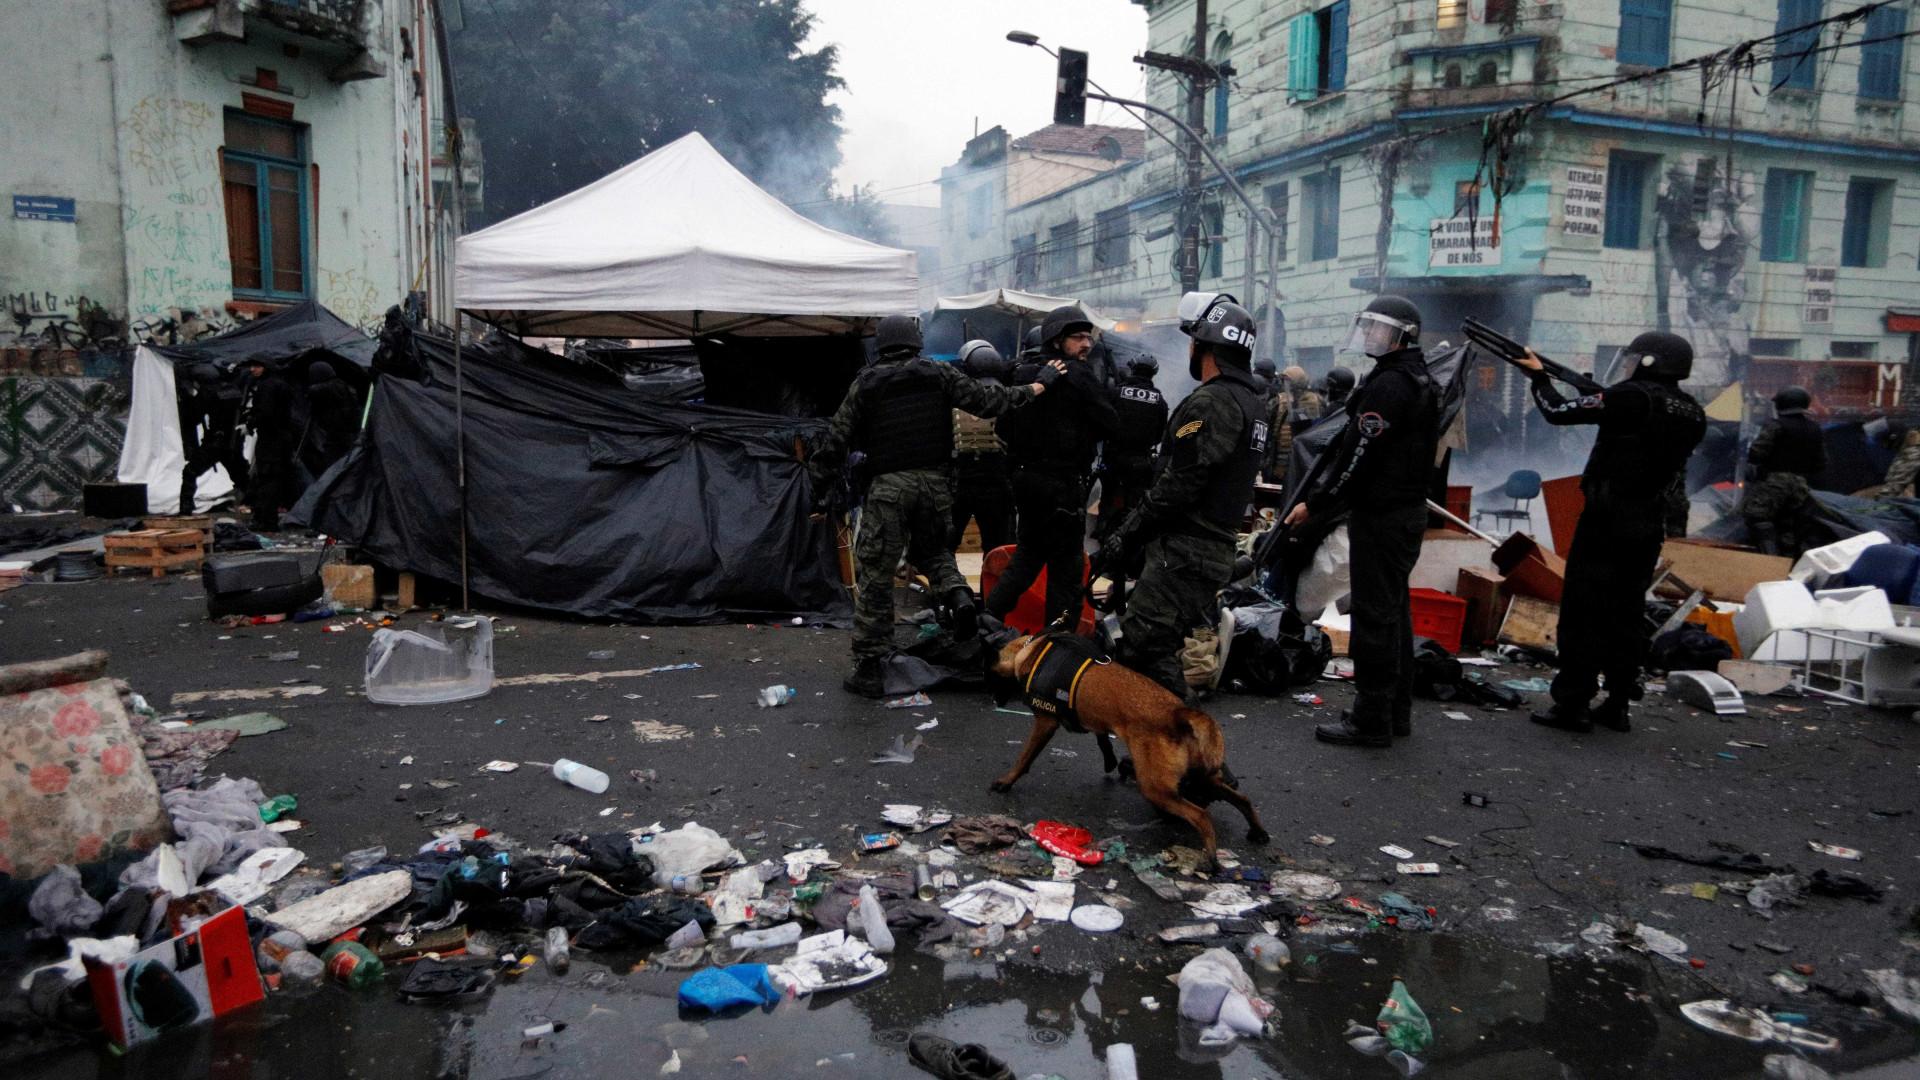 Conflito na cracolândia tem bomba contra centro da prefeitura